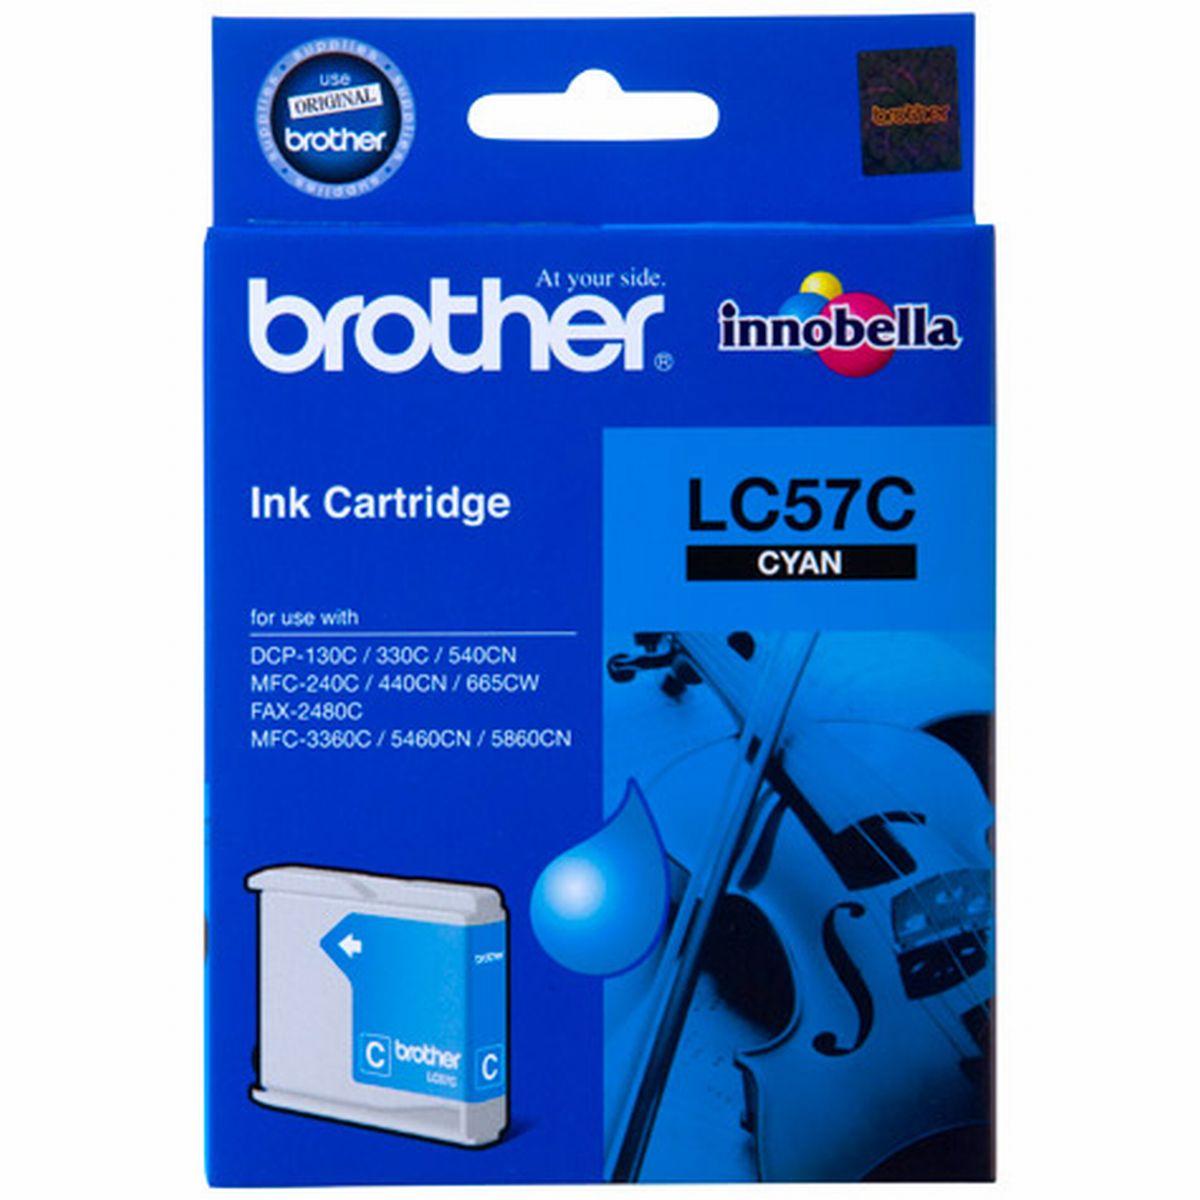 Brother LC-57C ตลับหมึกอิงค์เจ็ท สีฟ้า Cyan Original Ink Cartridge